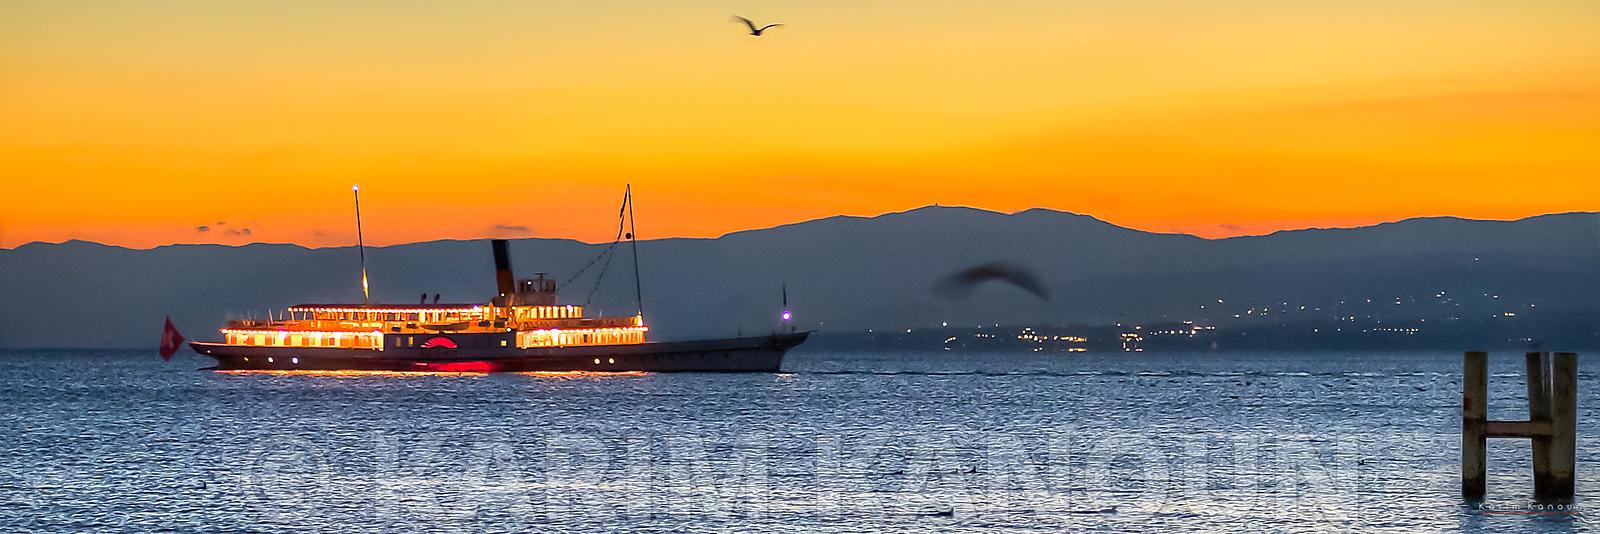 Panorama - CGN steam boat sunset cruise